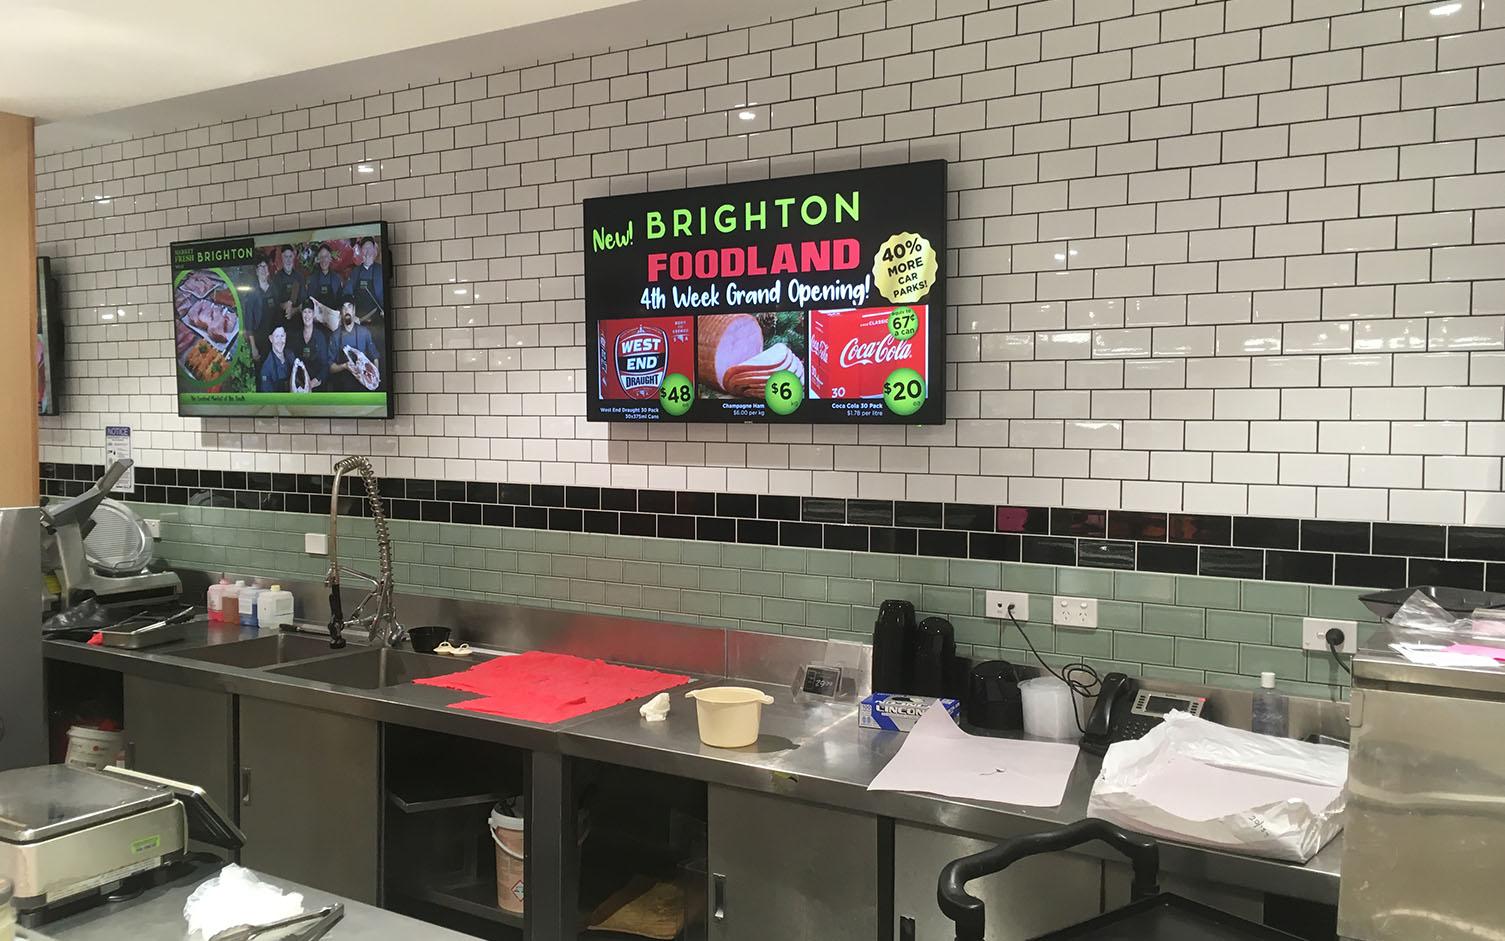 https://ggtiling.com.au/wp-content/uploads/2018/11/Brighton-Central-Shopping-Centre_0007_20180226_062304935_iOS.jpg